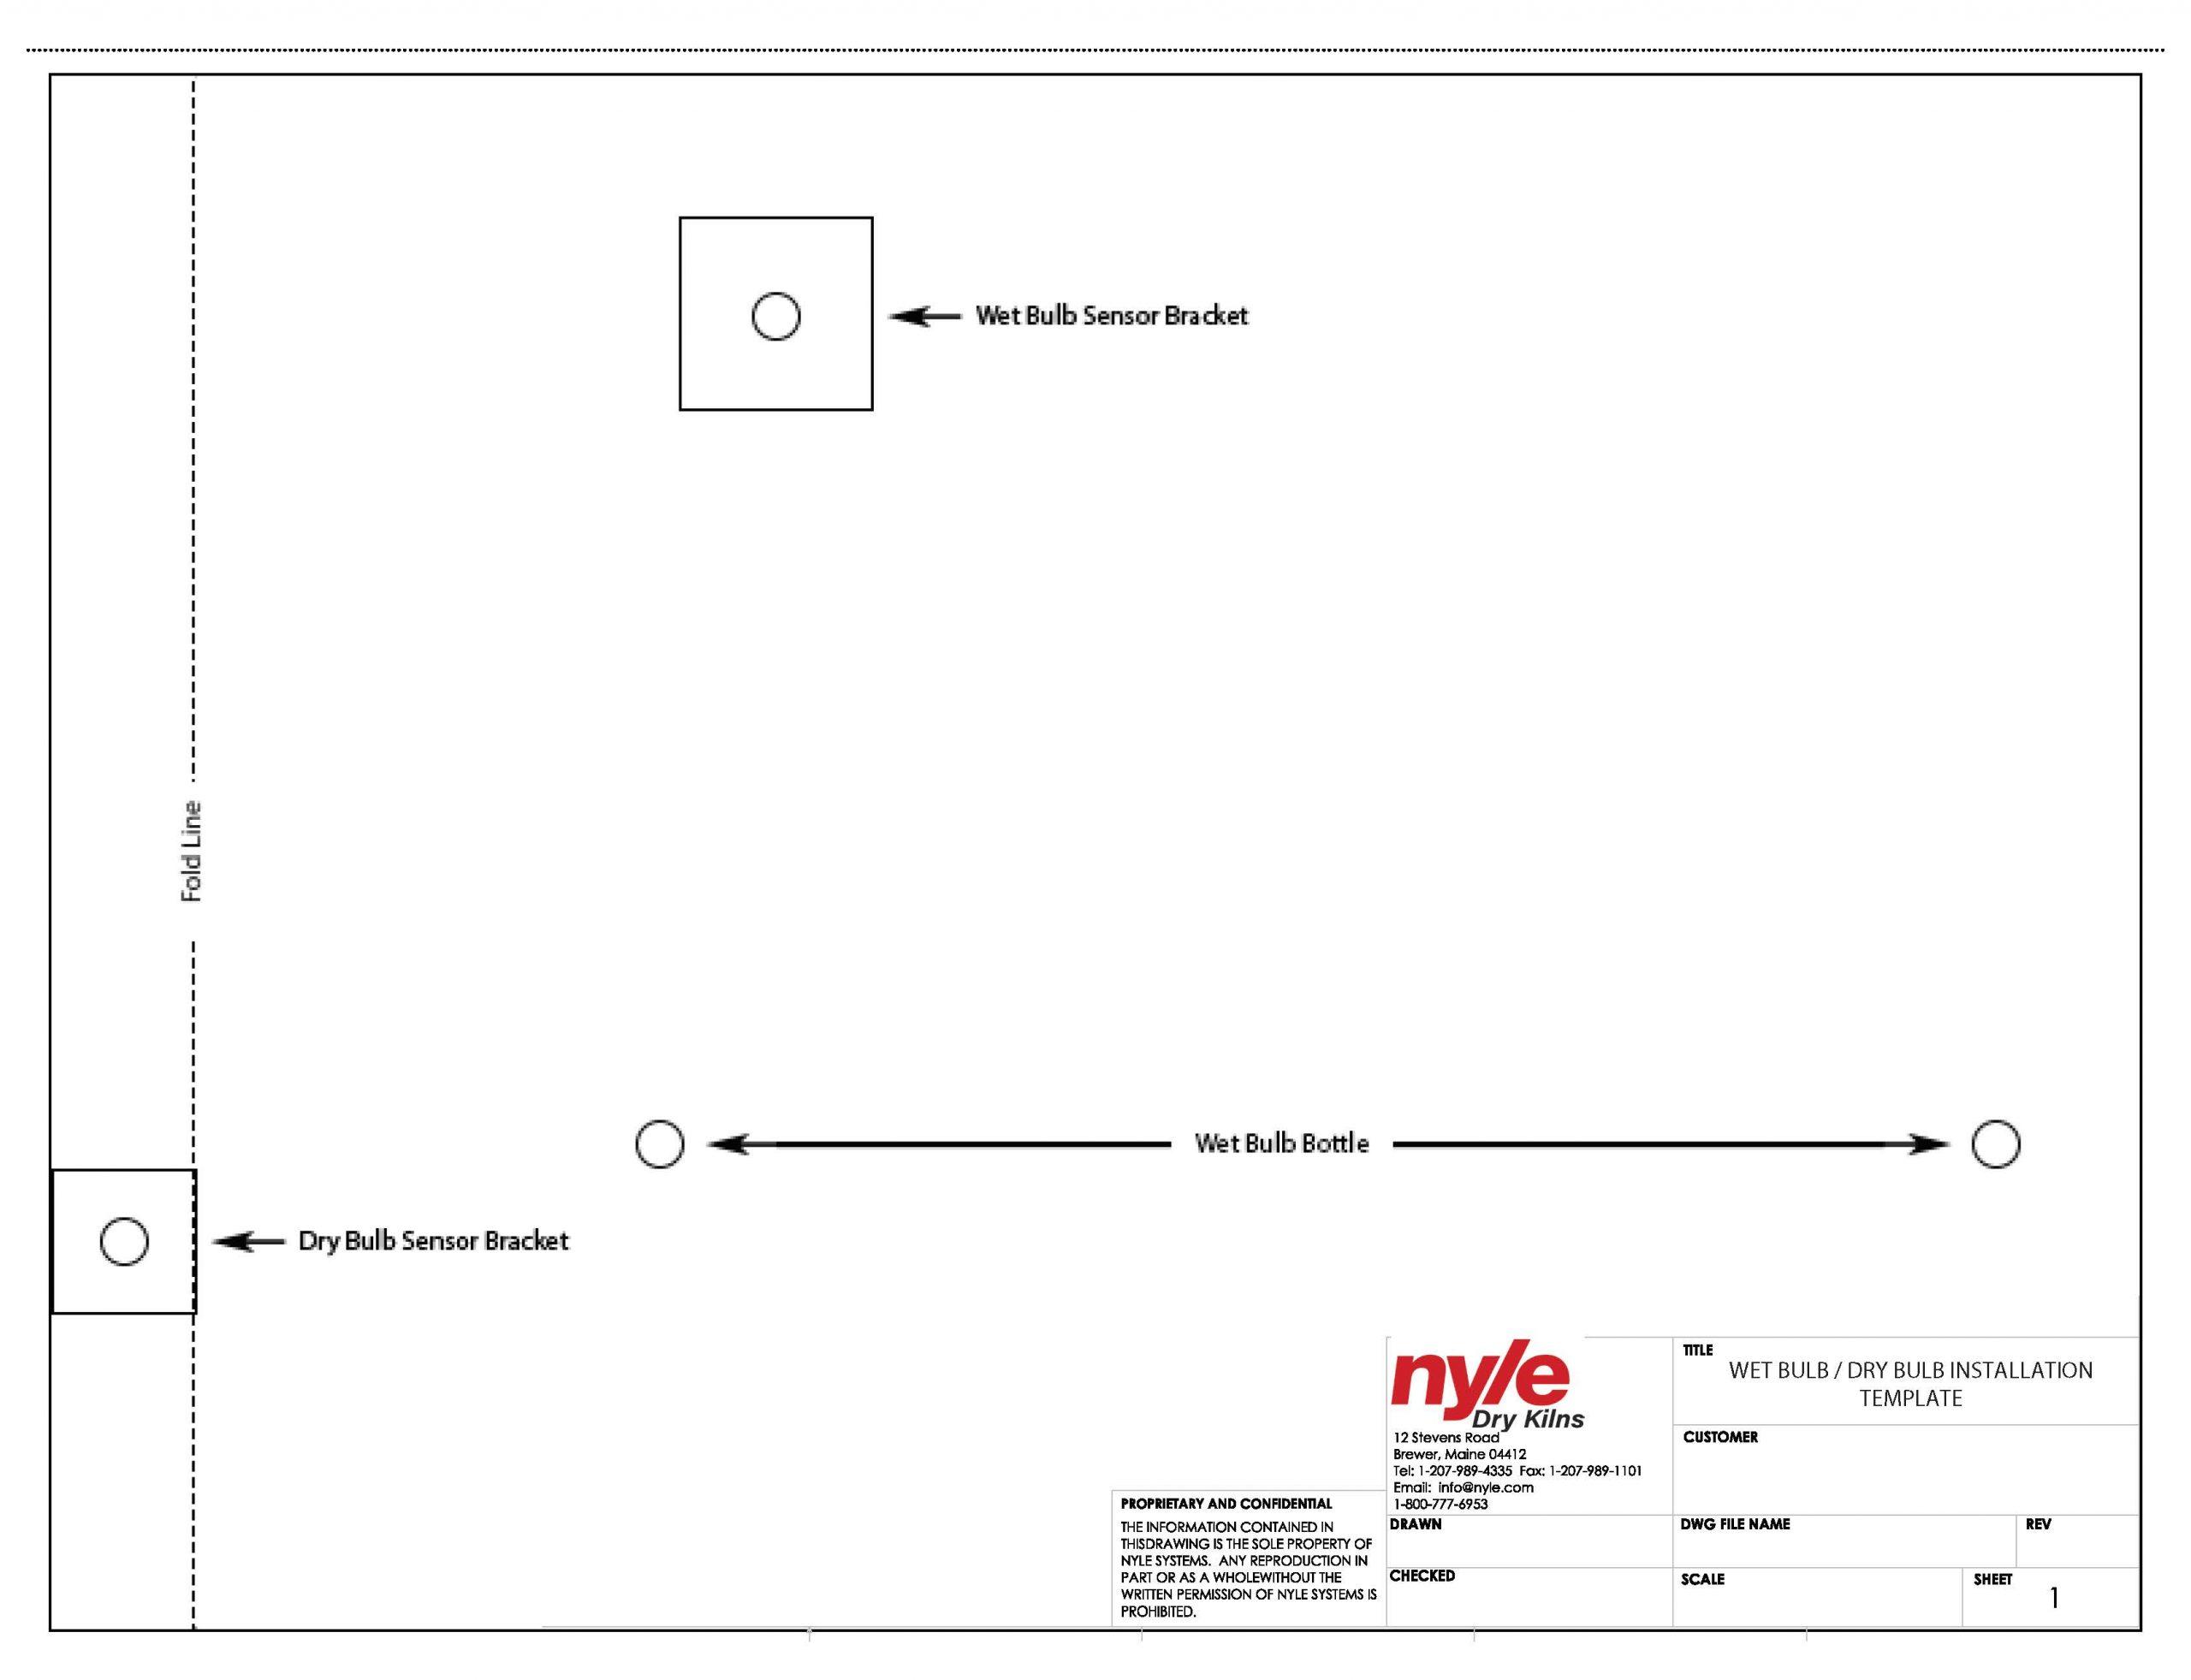 Wet Bulb / Dry Bulb Installation Template